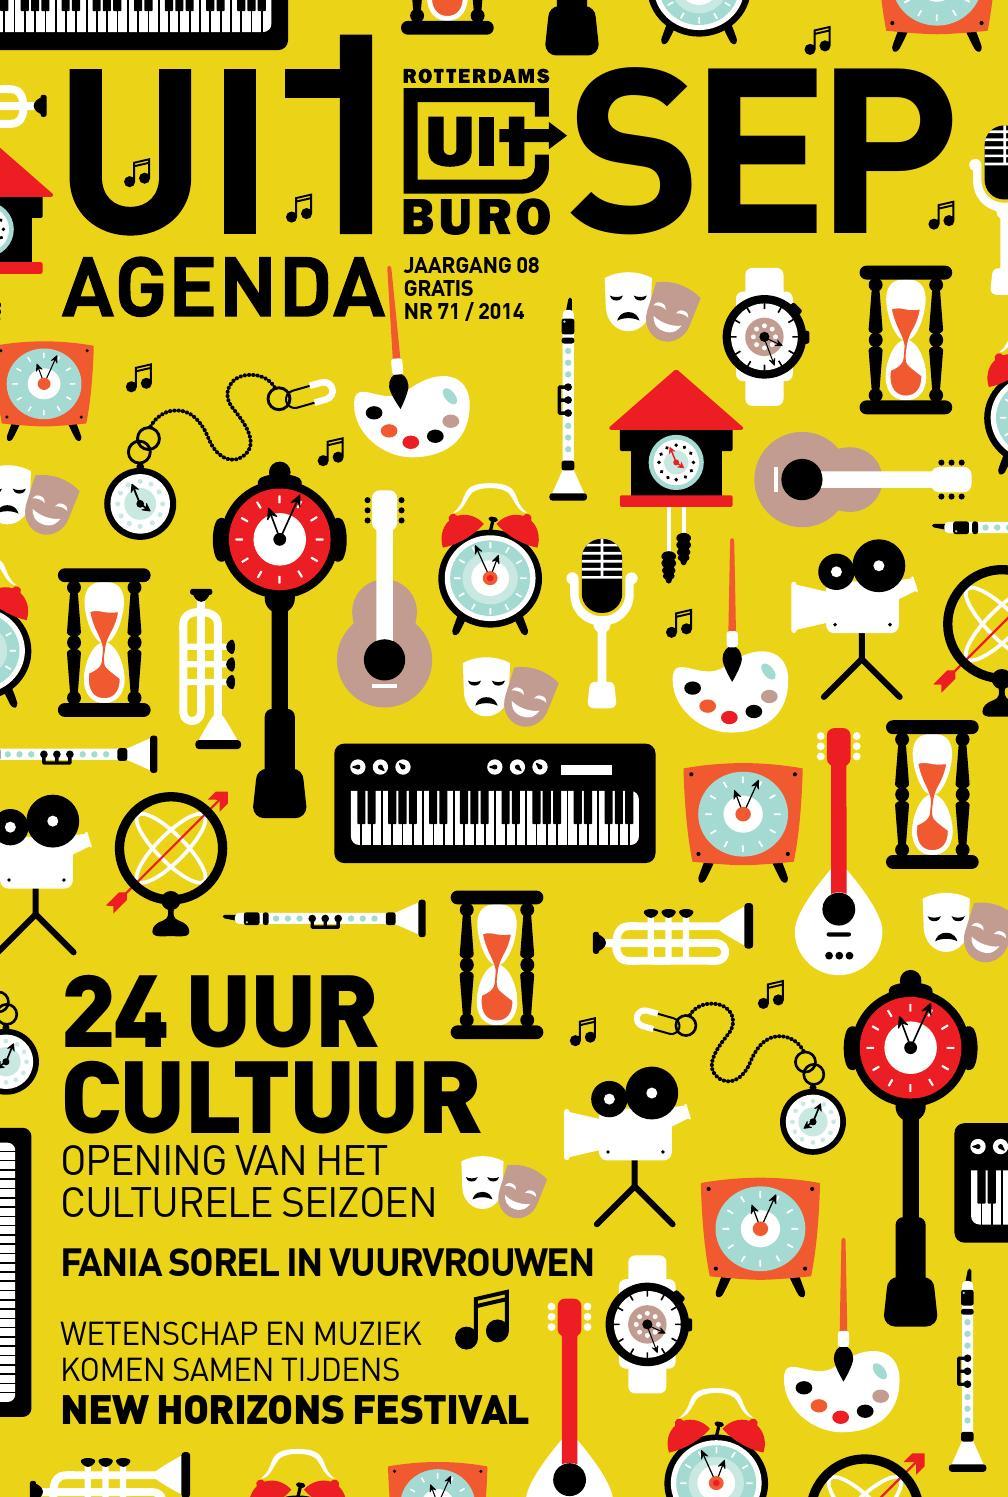 Uitagenda rotterdam september 2014 by rotterdam festivals for Uit agenda rotterdam